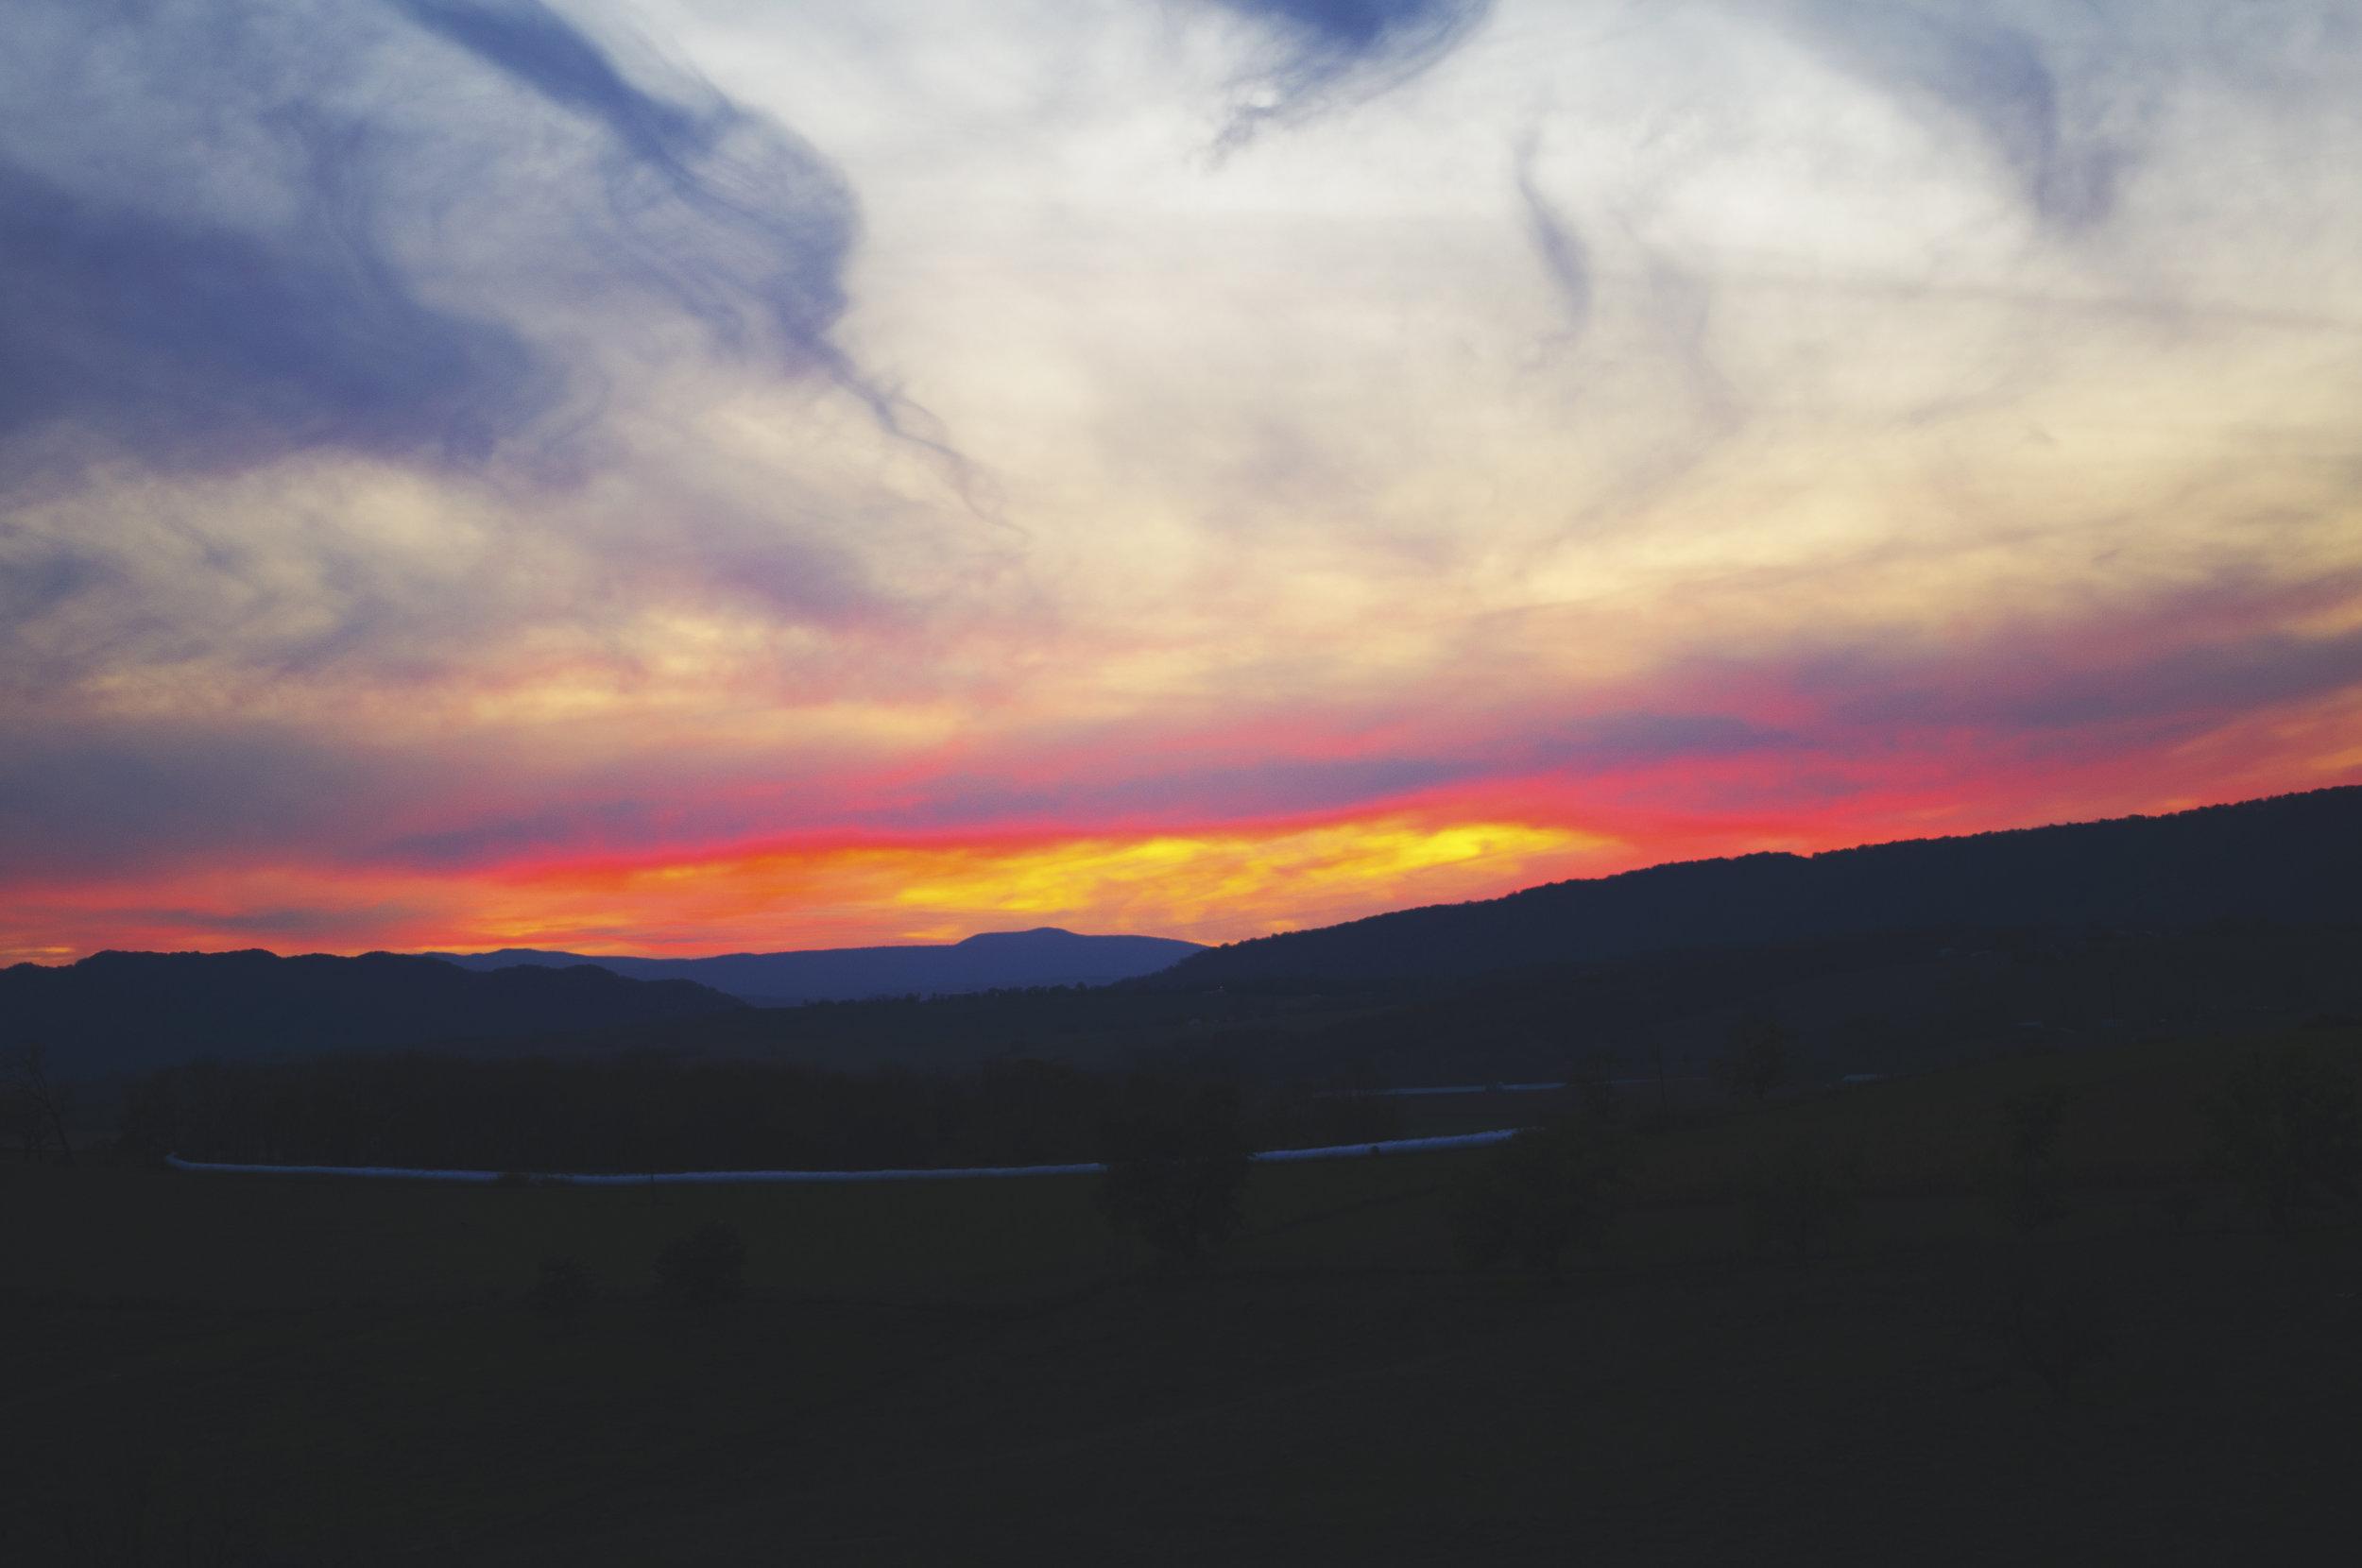 sunset-oct17-2.jpg